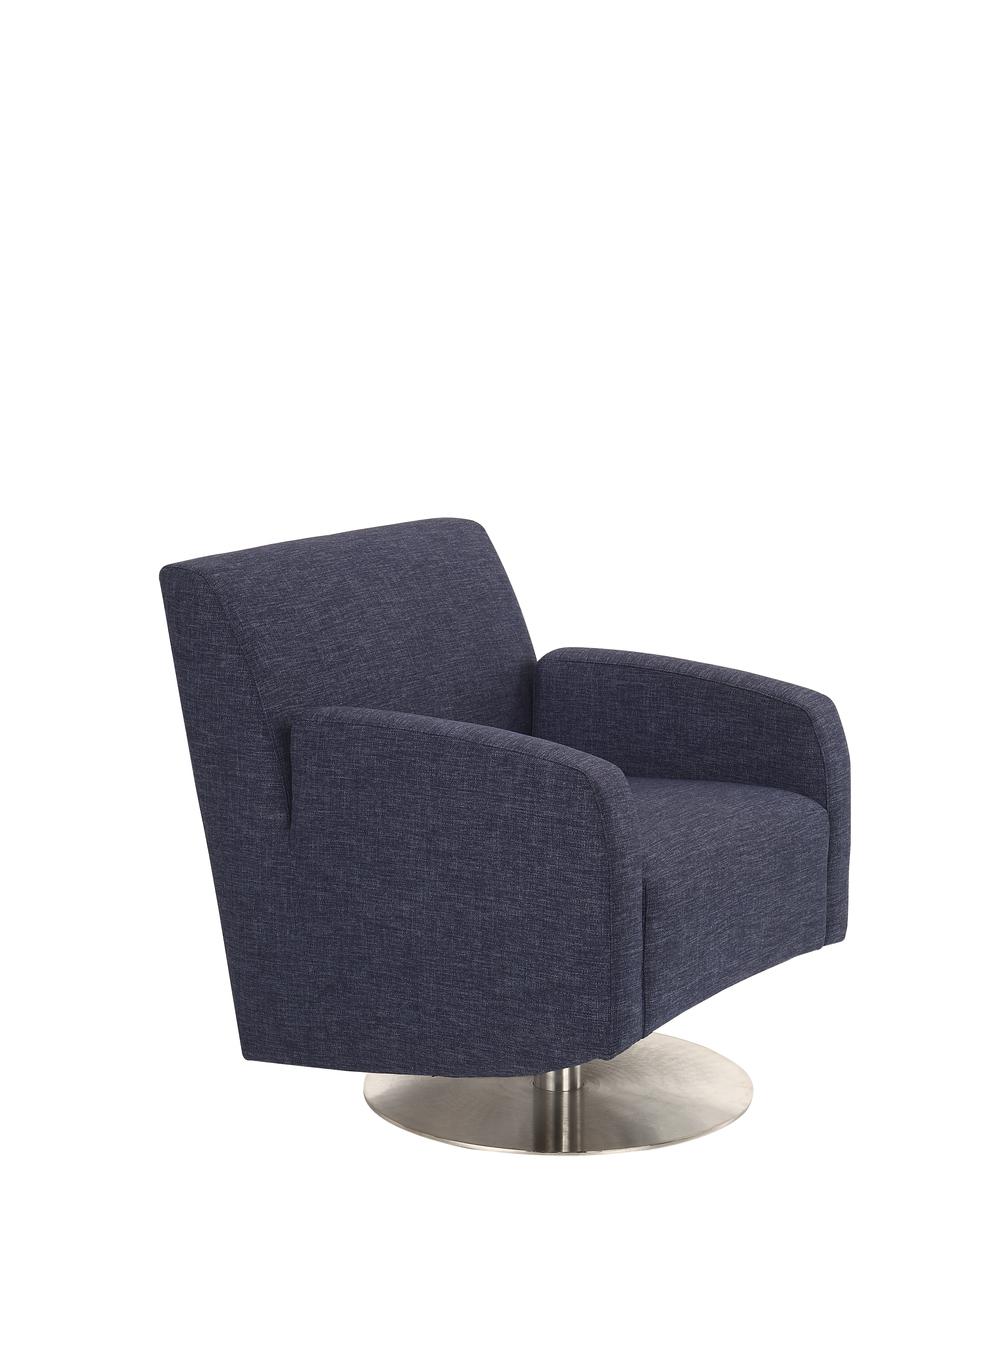 Lazar - Pilot Swivel Chair